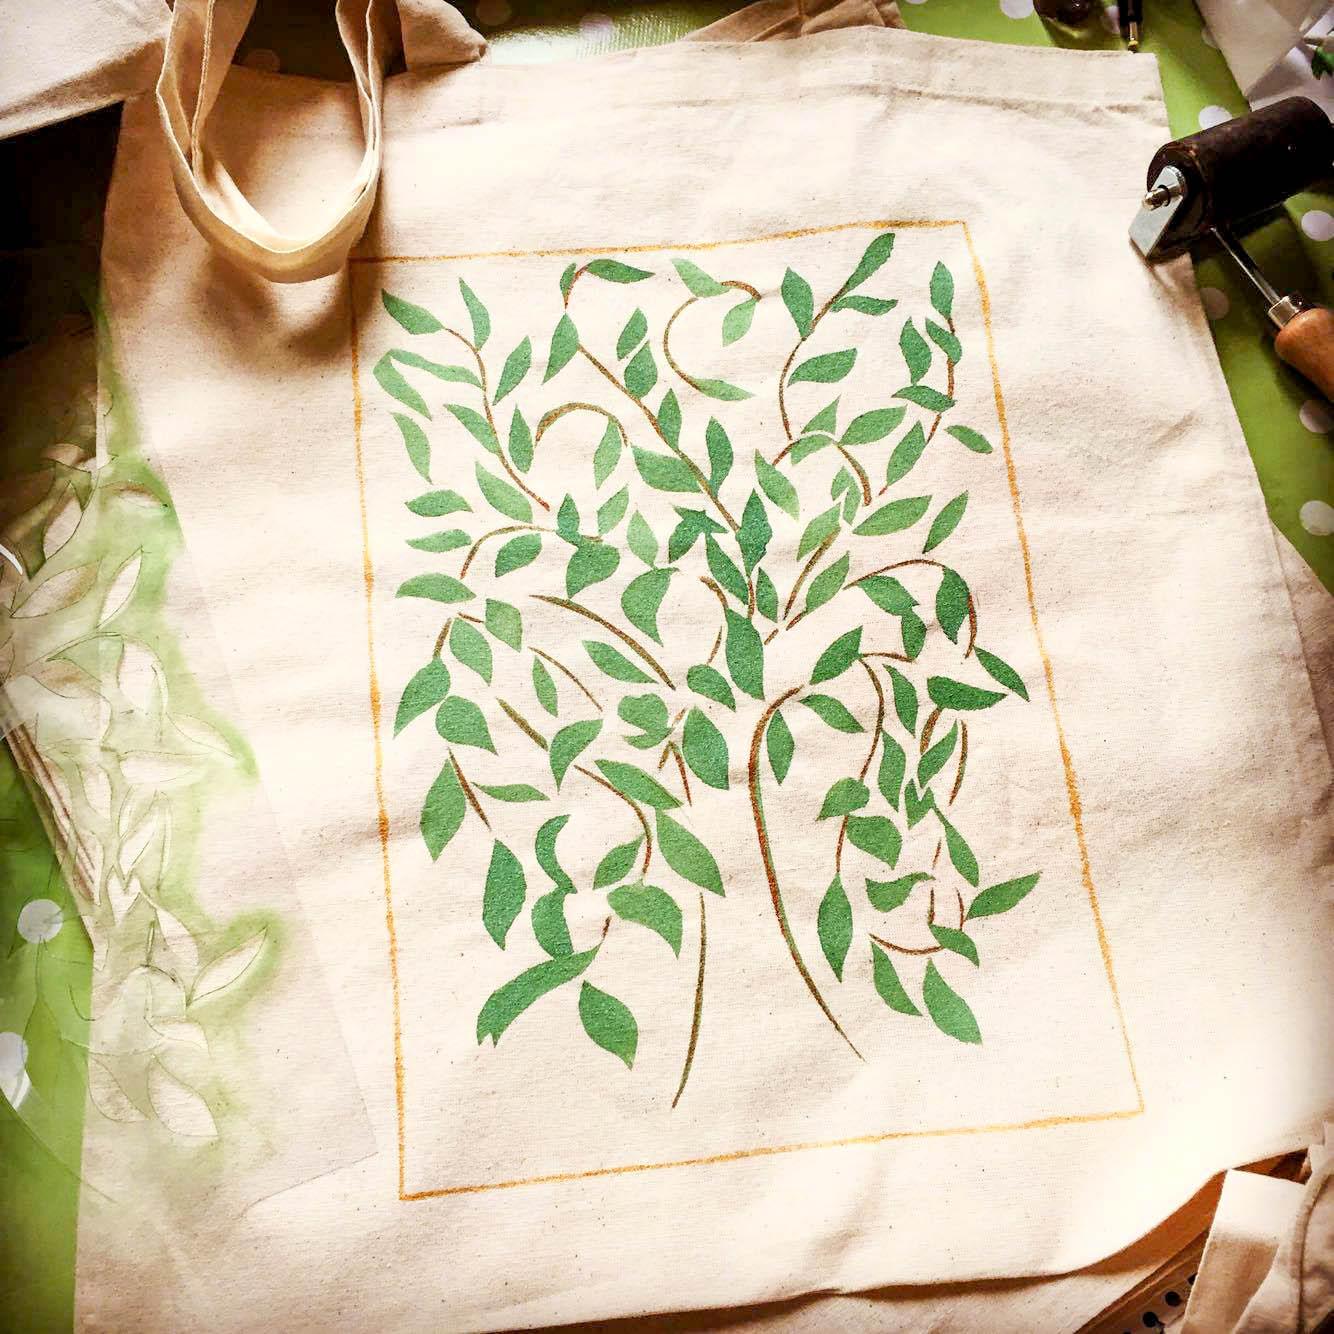 Stencil Eco Bag